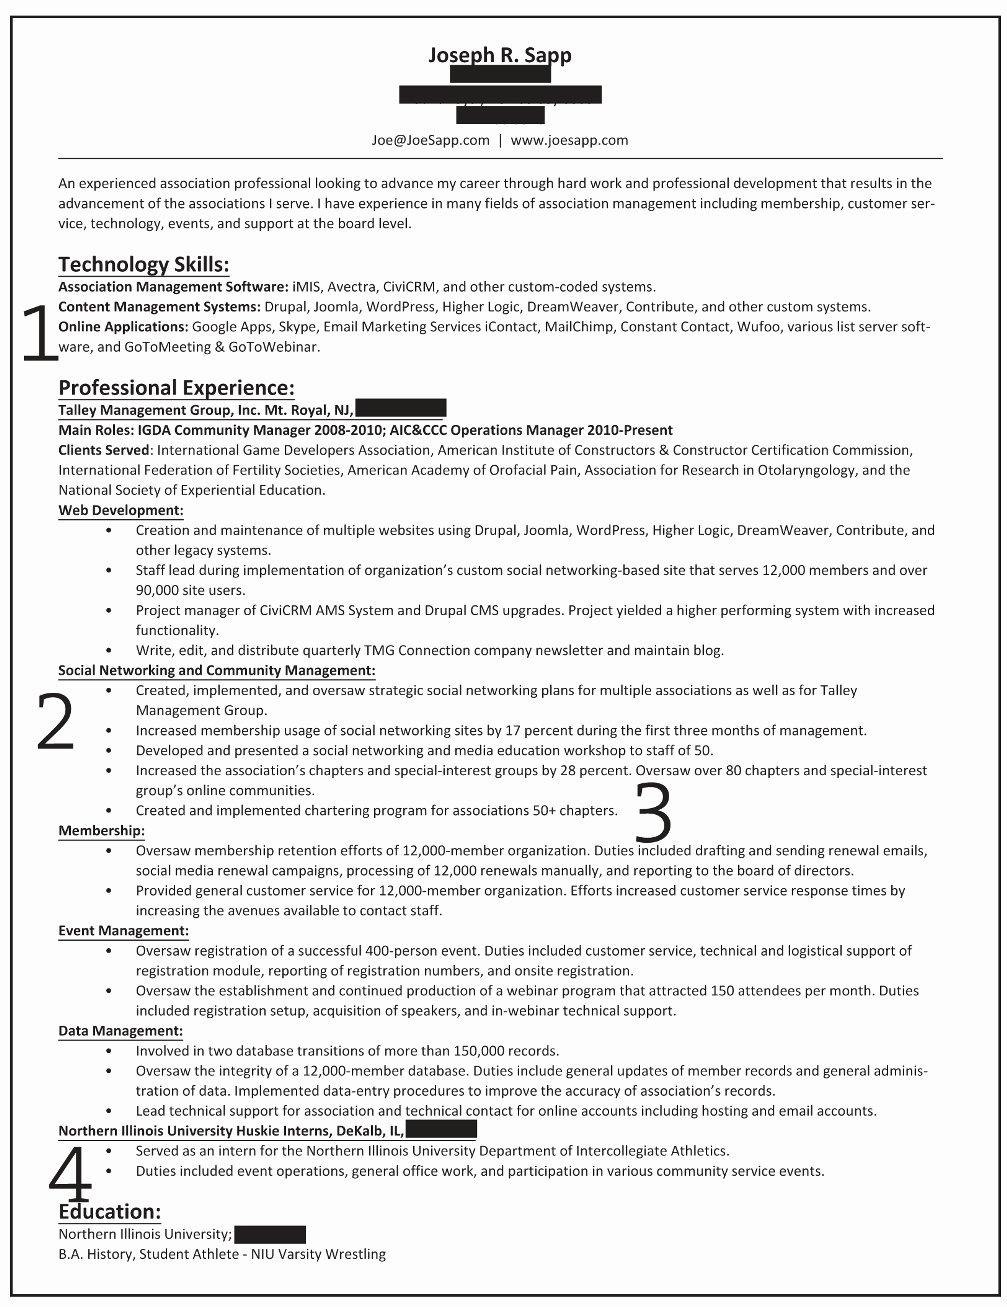 Qualifications for Resume List Staruptalent